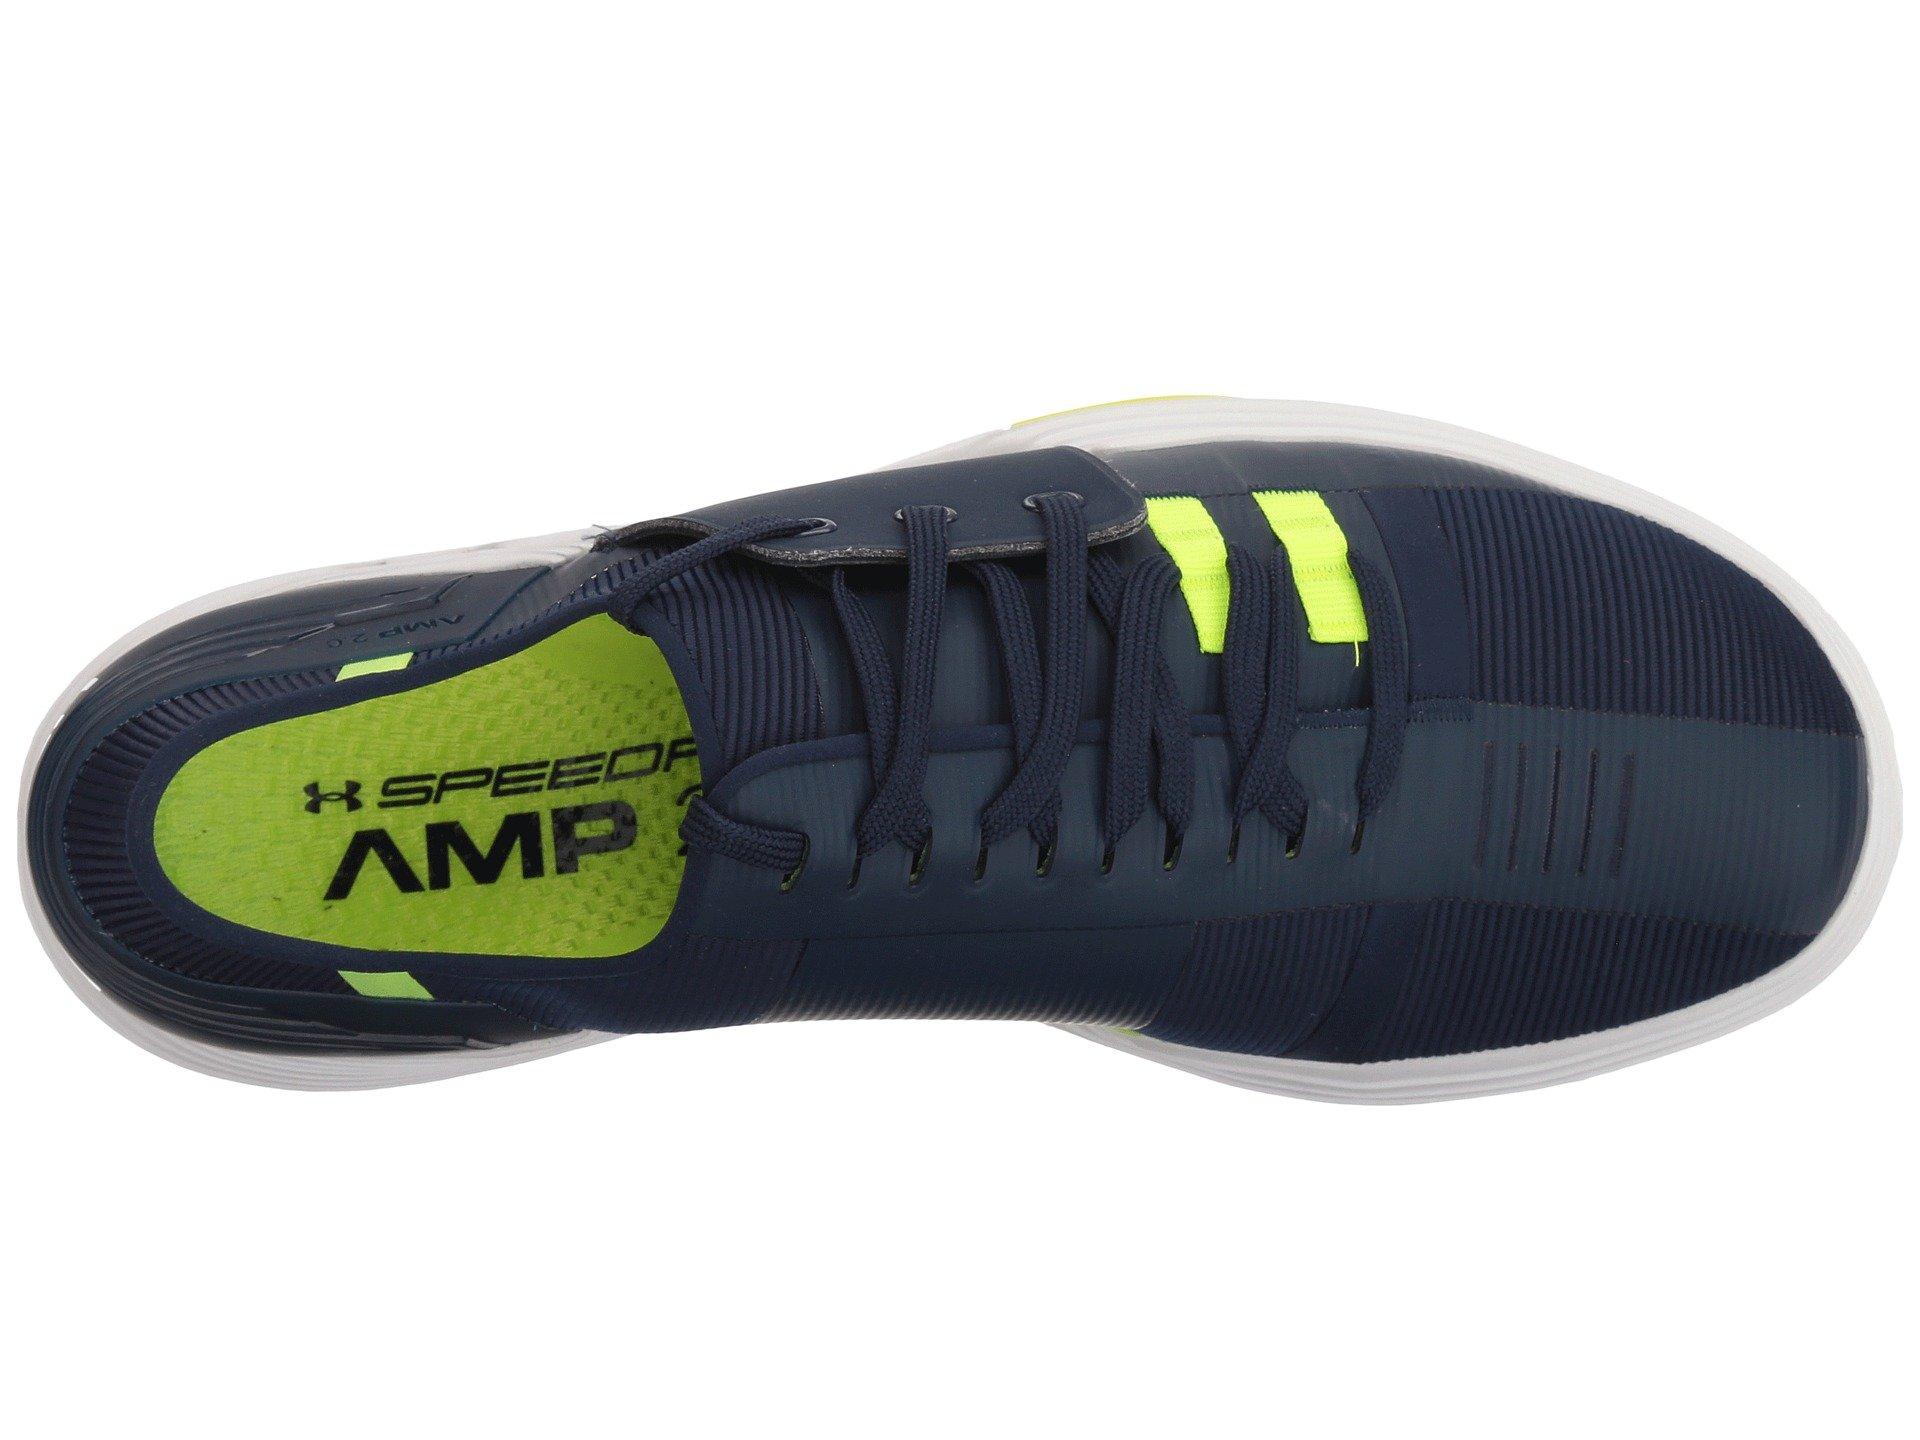 Amp Armour Yellow Ua Under academy Academy 2 0 Speedform vis high twpwZq